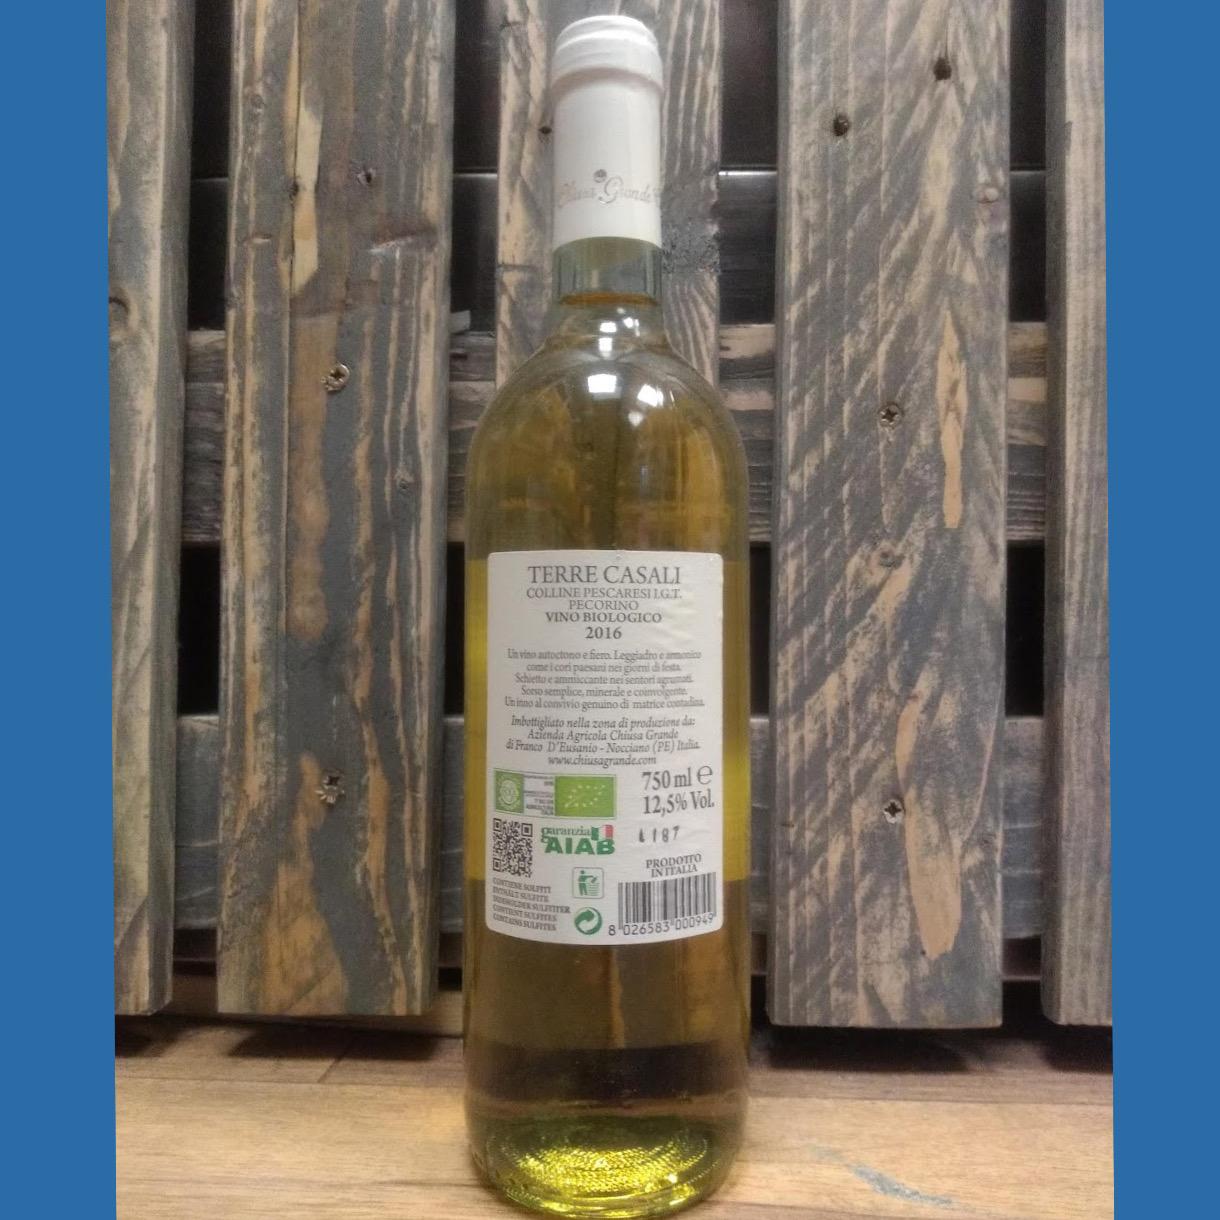 TERRE CASALI Pecorino Colline Pescaresi I.G.T. Organic White Wine 12.5% 750ml